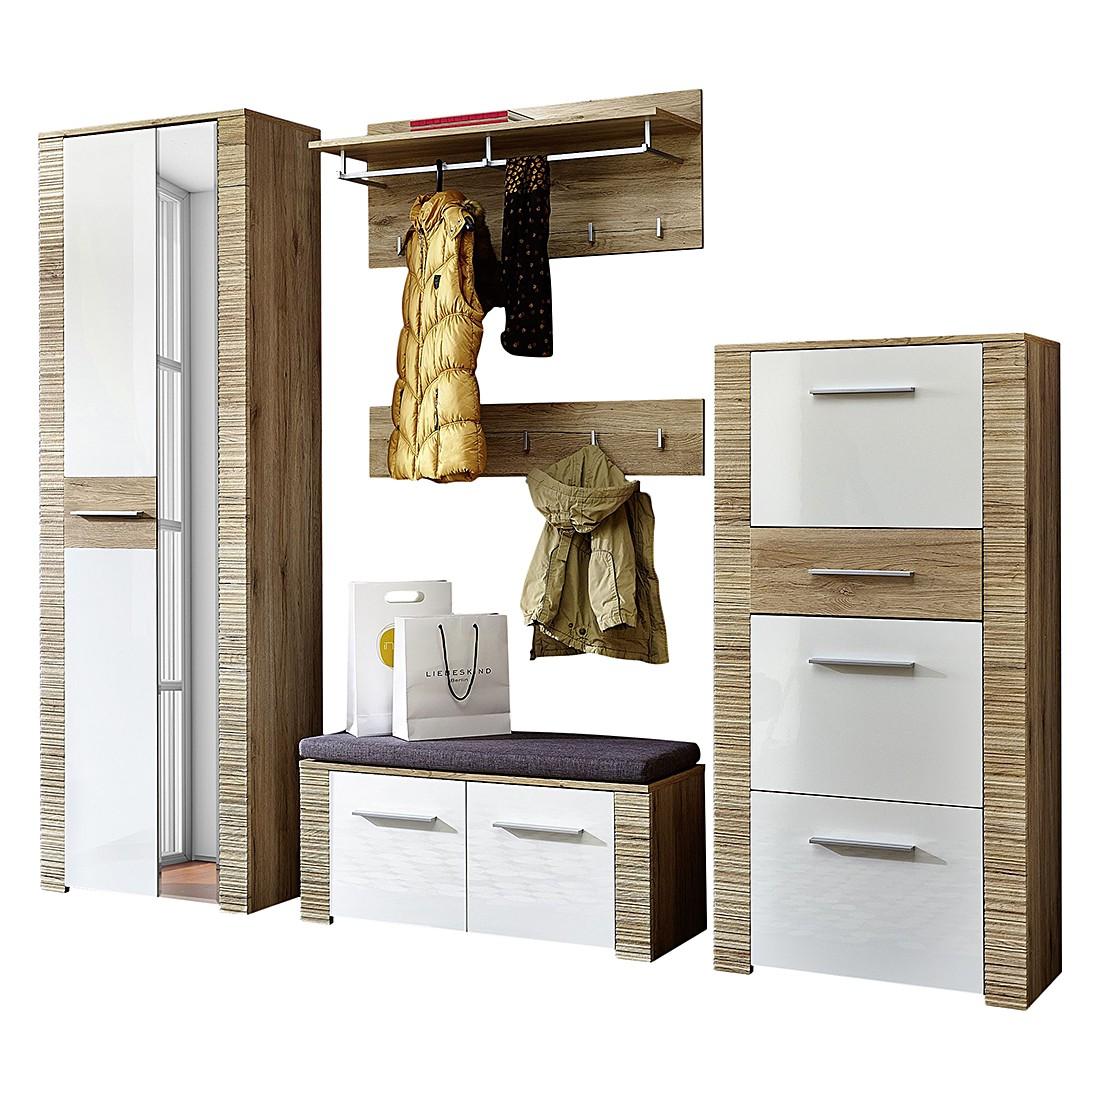 Home 24 - Ensemble de vestibule rowdy (5 éléments) - imitation chêne de san remo / blanc brillant, modoform